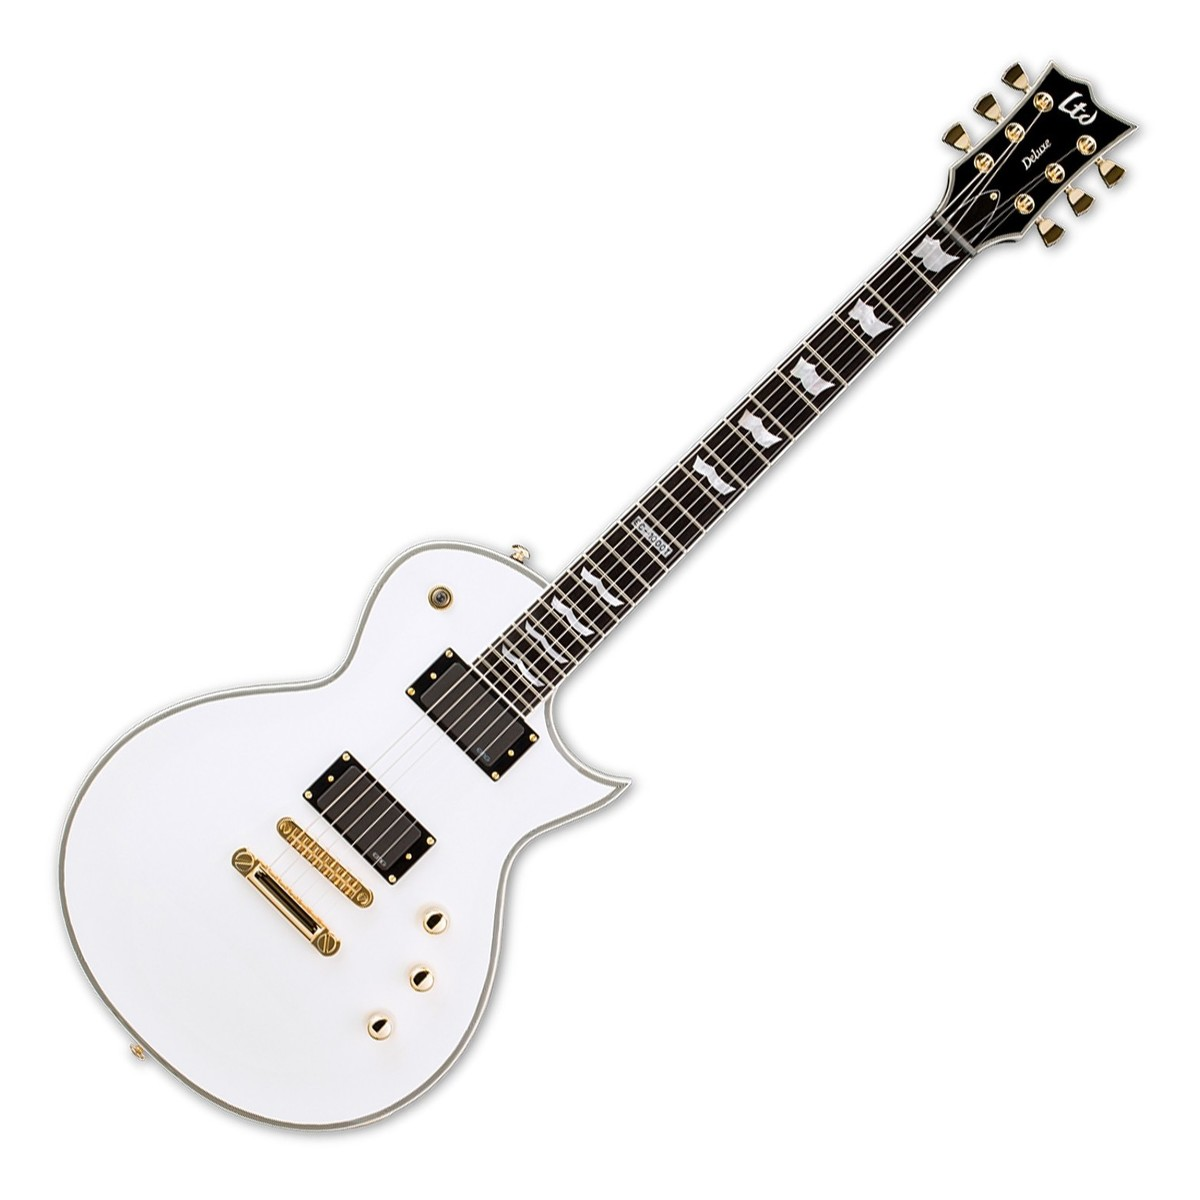 Esp Ltd Ec T Ctm Electric Guitar Snow White At Gear4music